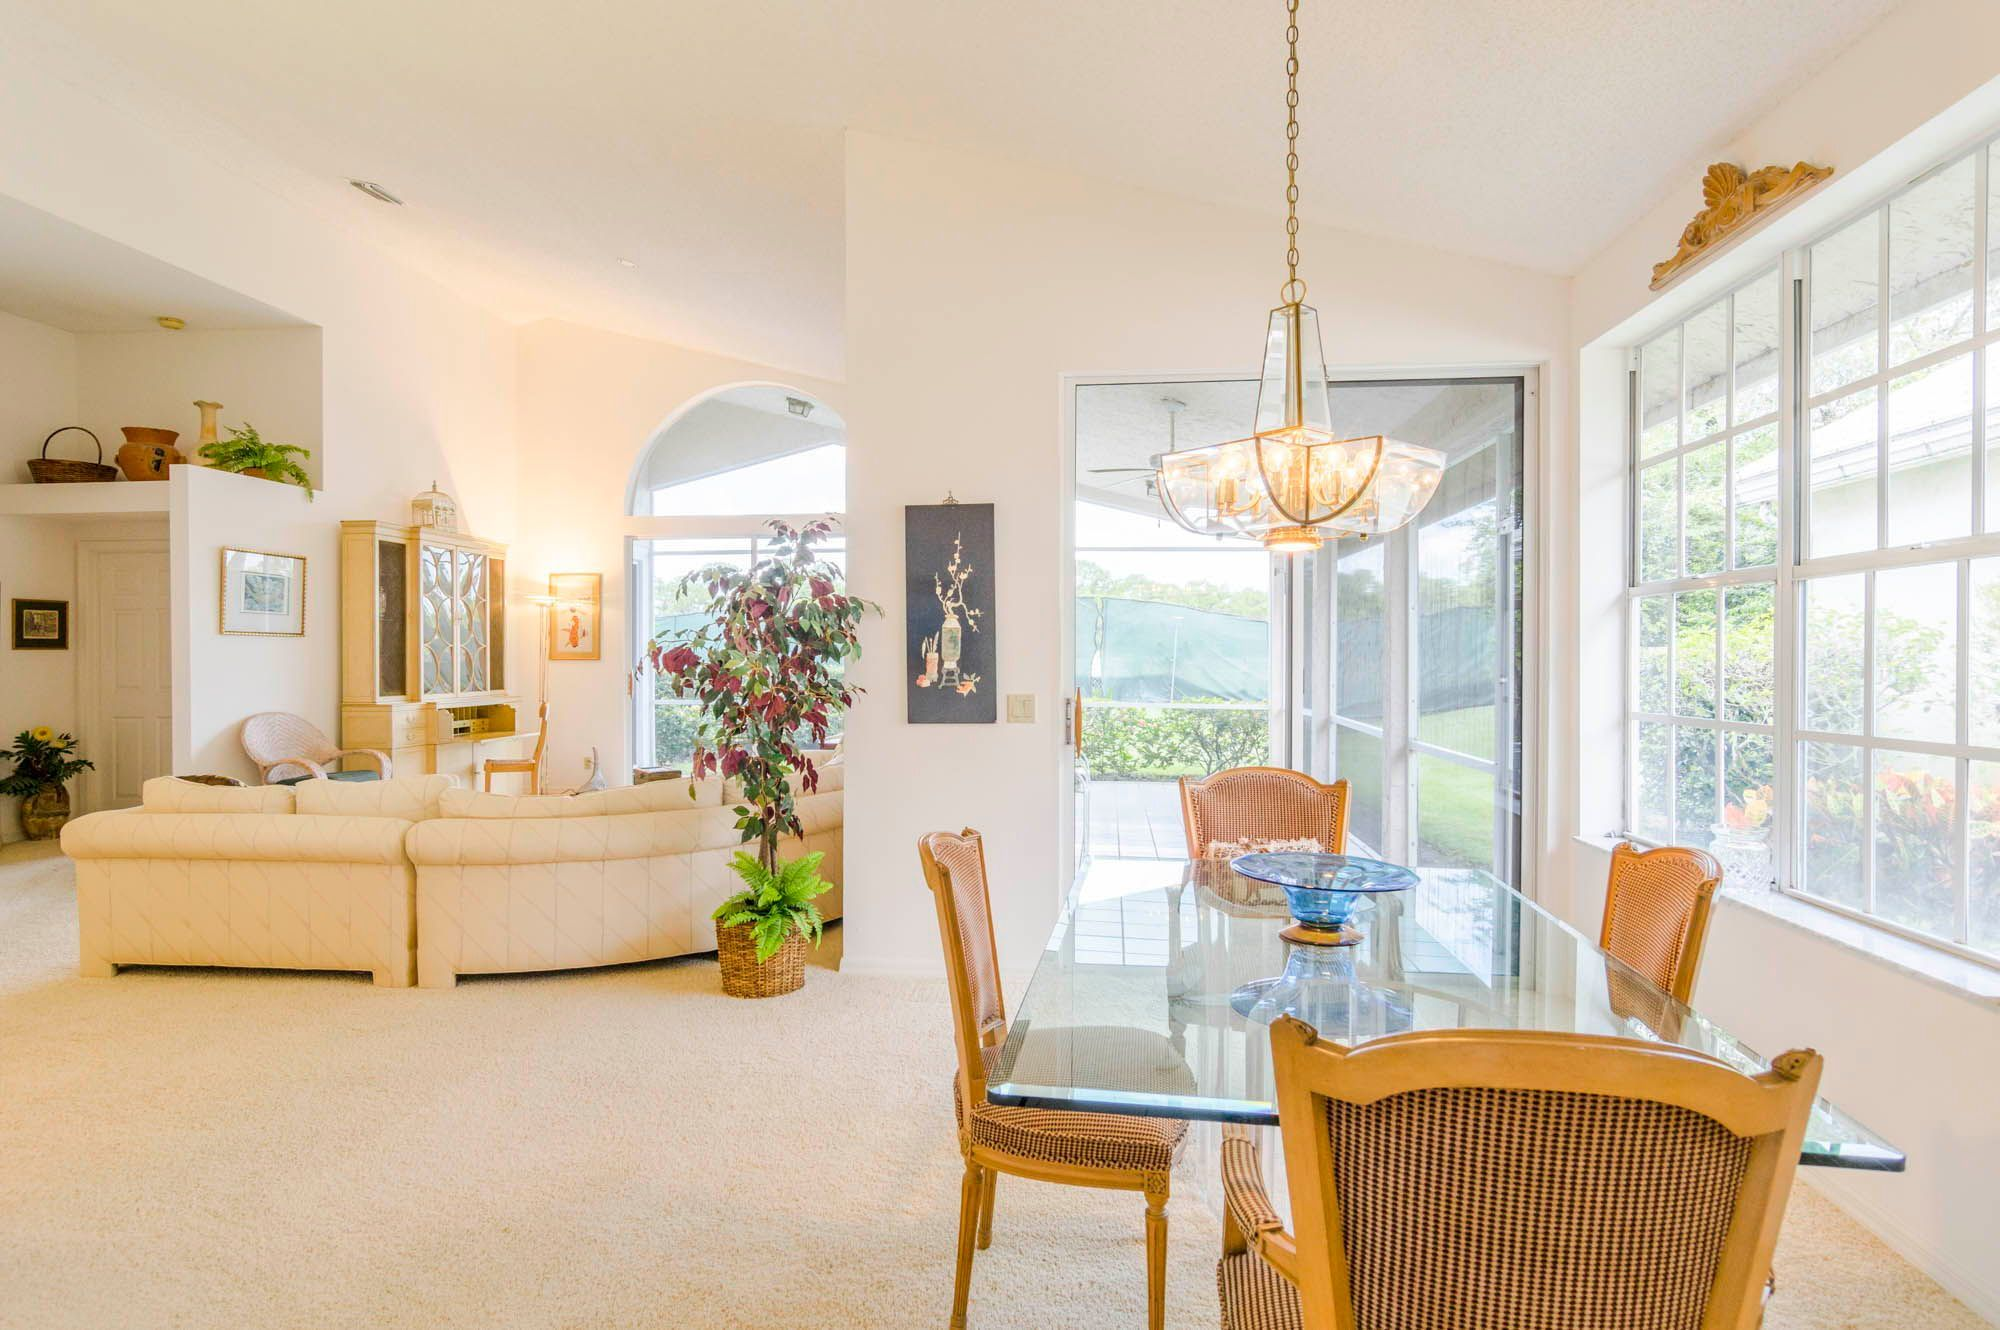 b9e058572245ca218c91362be1b8763b - Rooms For Rent Palm Beach Gardens Fl